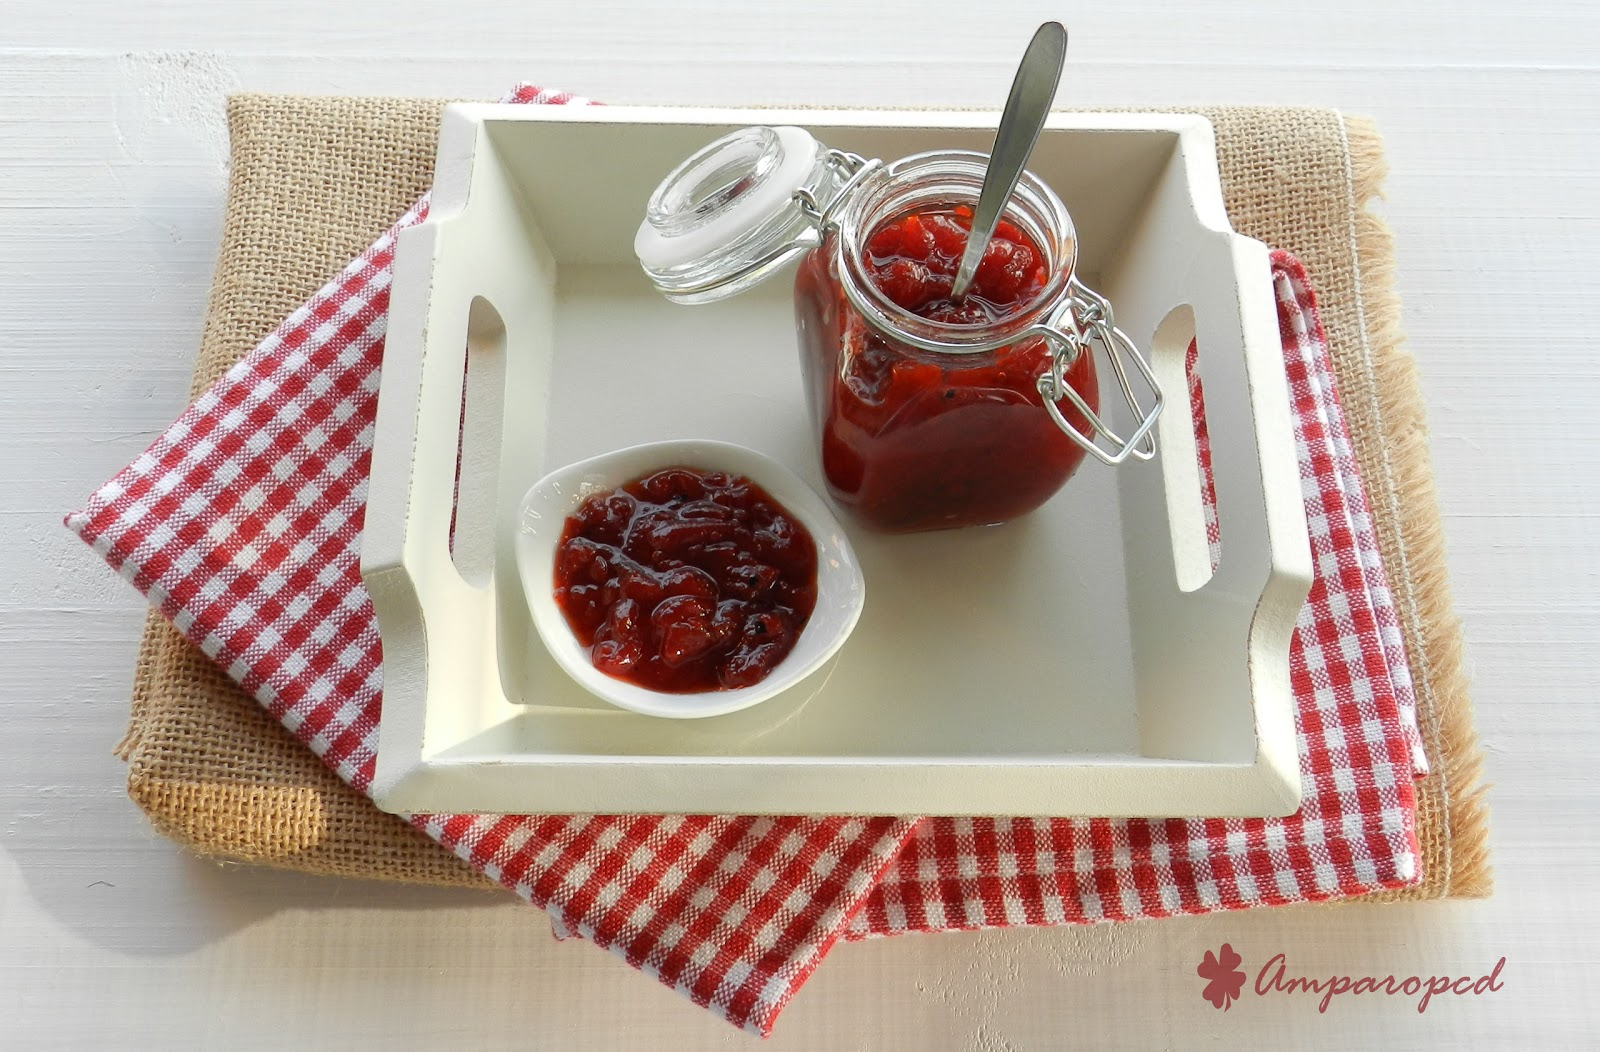 Dulc simos placeres mermelada de pimientos rojos - Mermelada de pimientos rojos ...